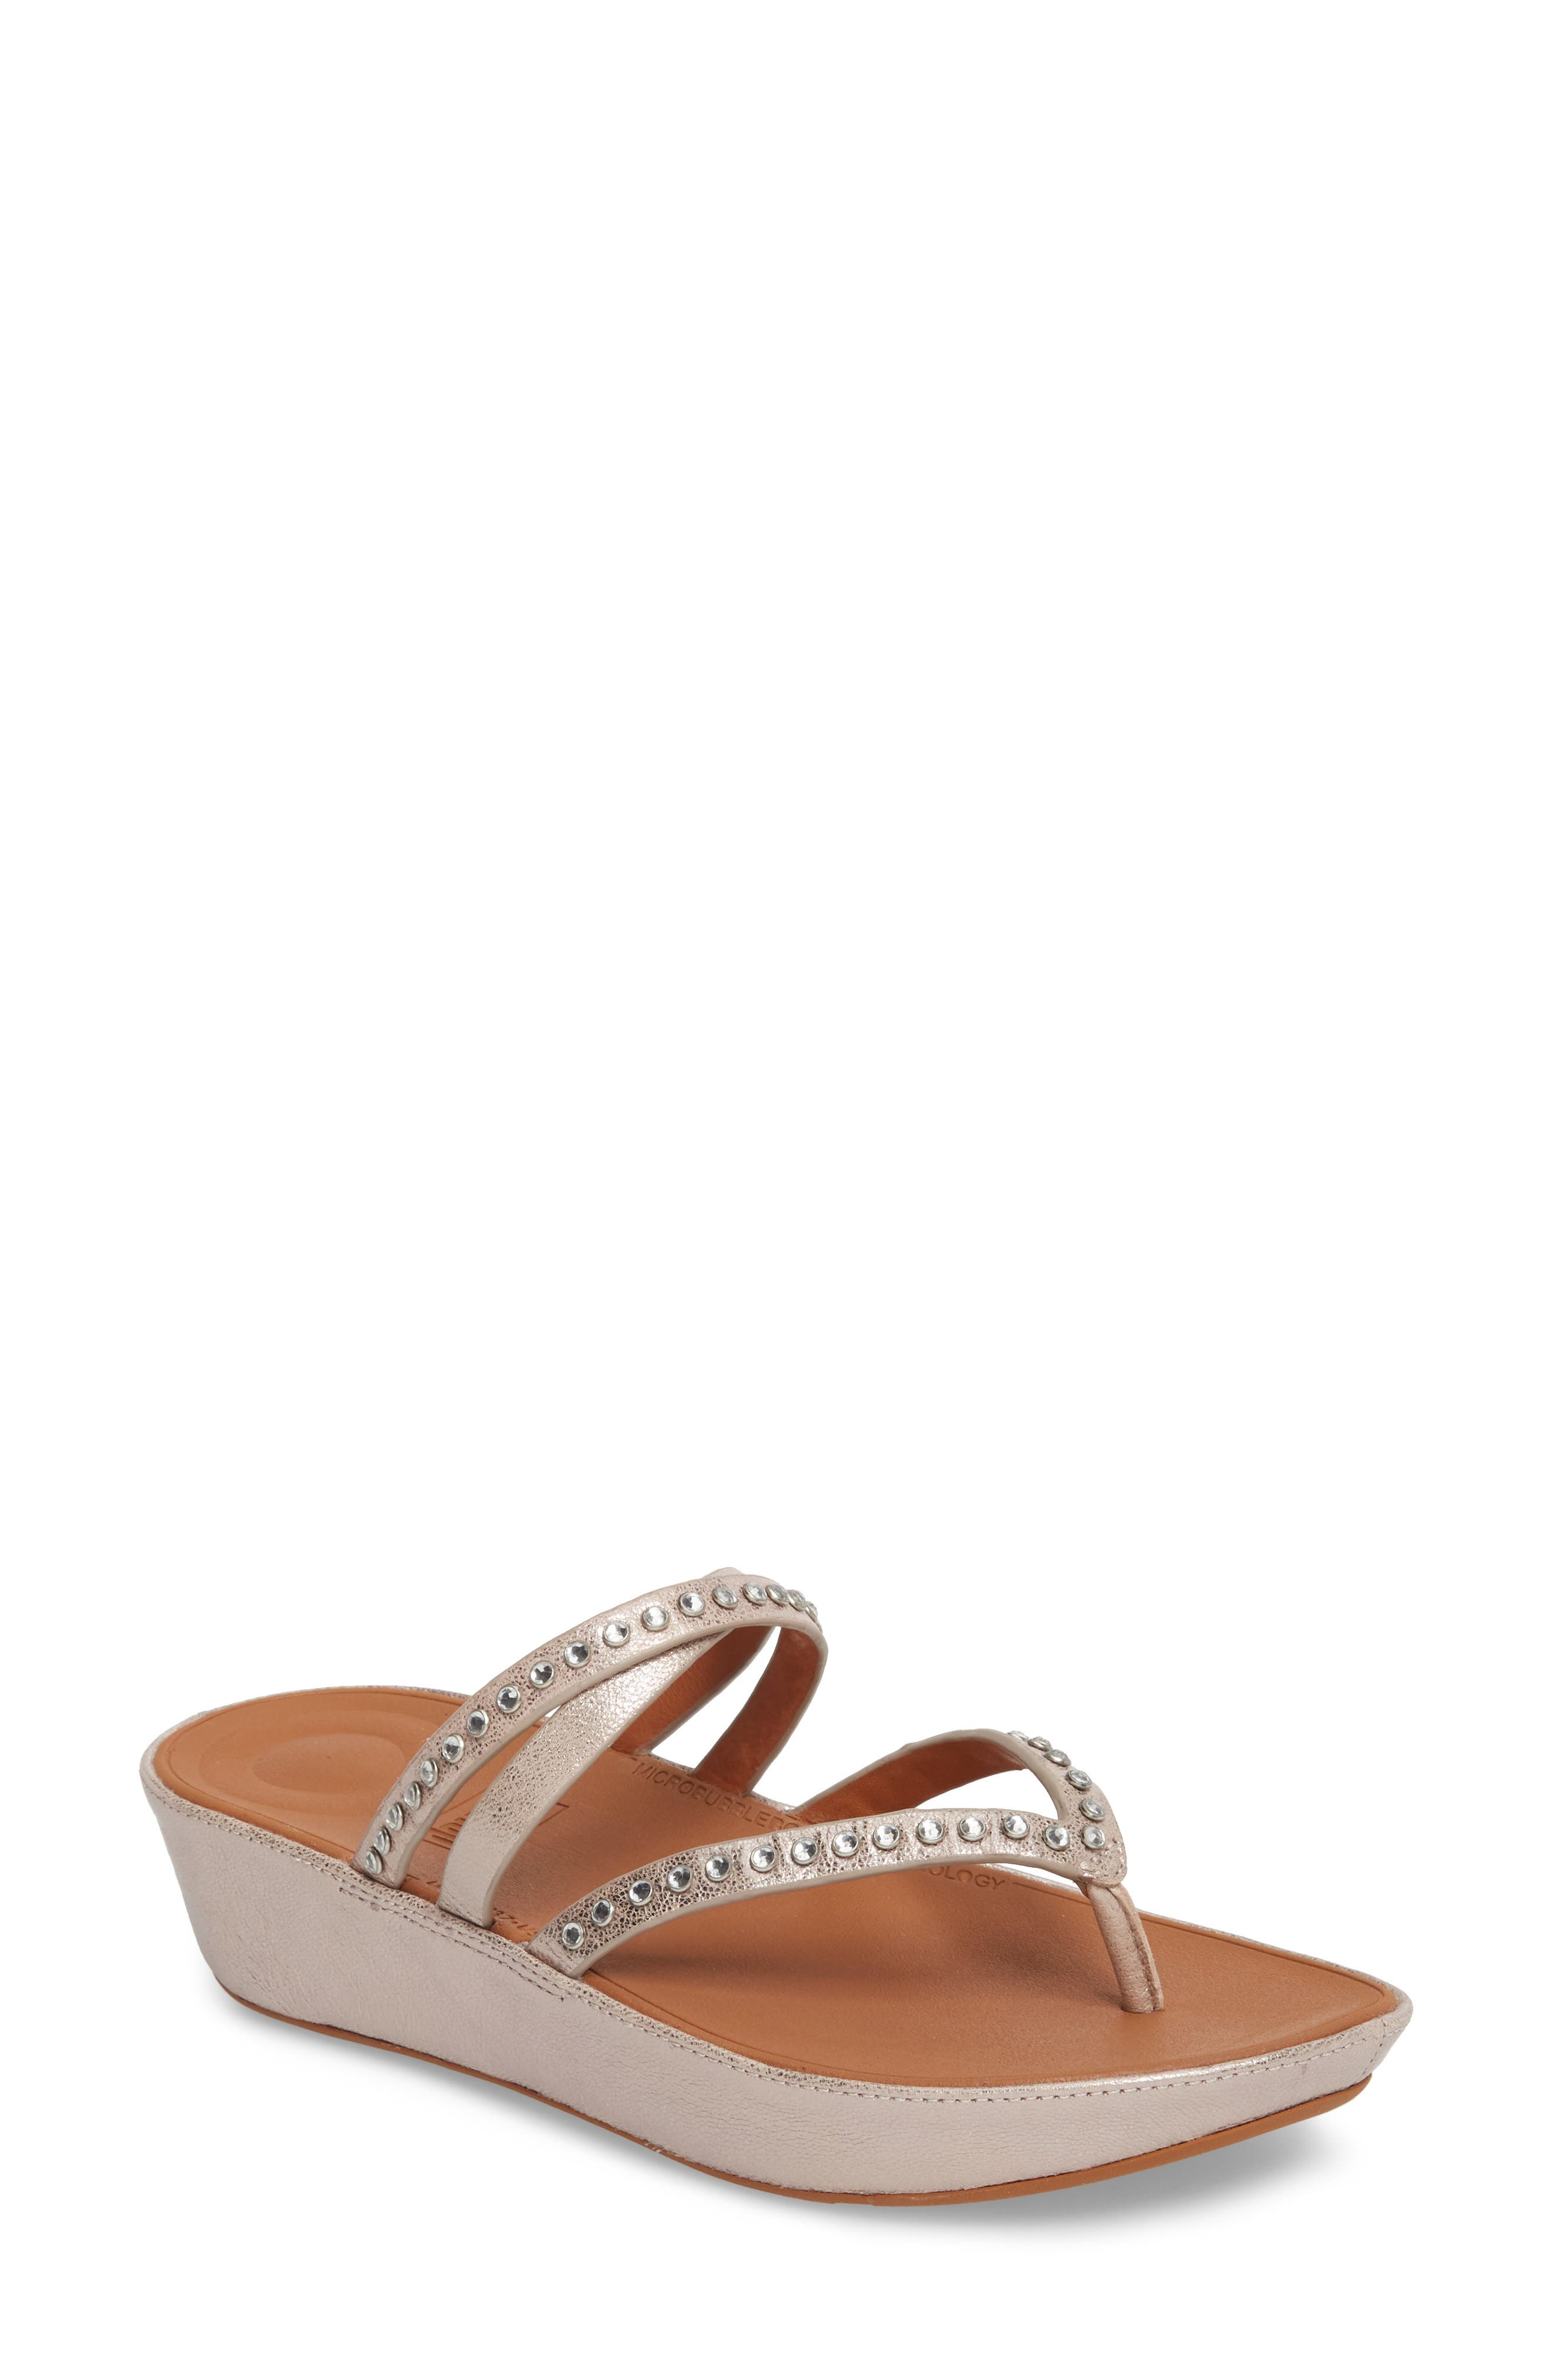 Linny Embellished Slide Sandal,                             Main thumbnail 1, color,                             Blush/ Metallic Nude Leather